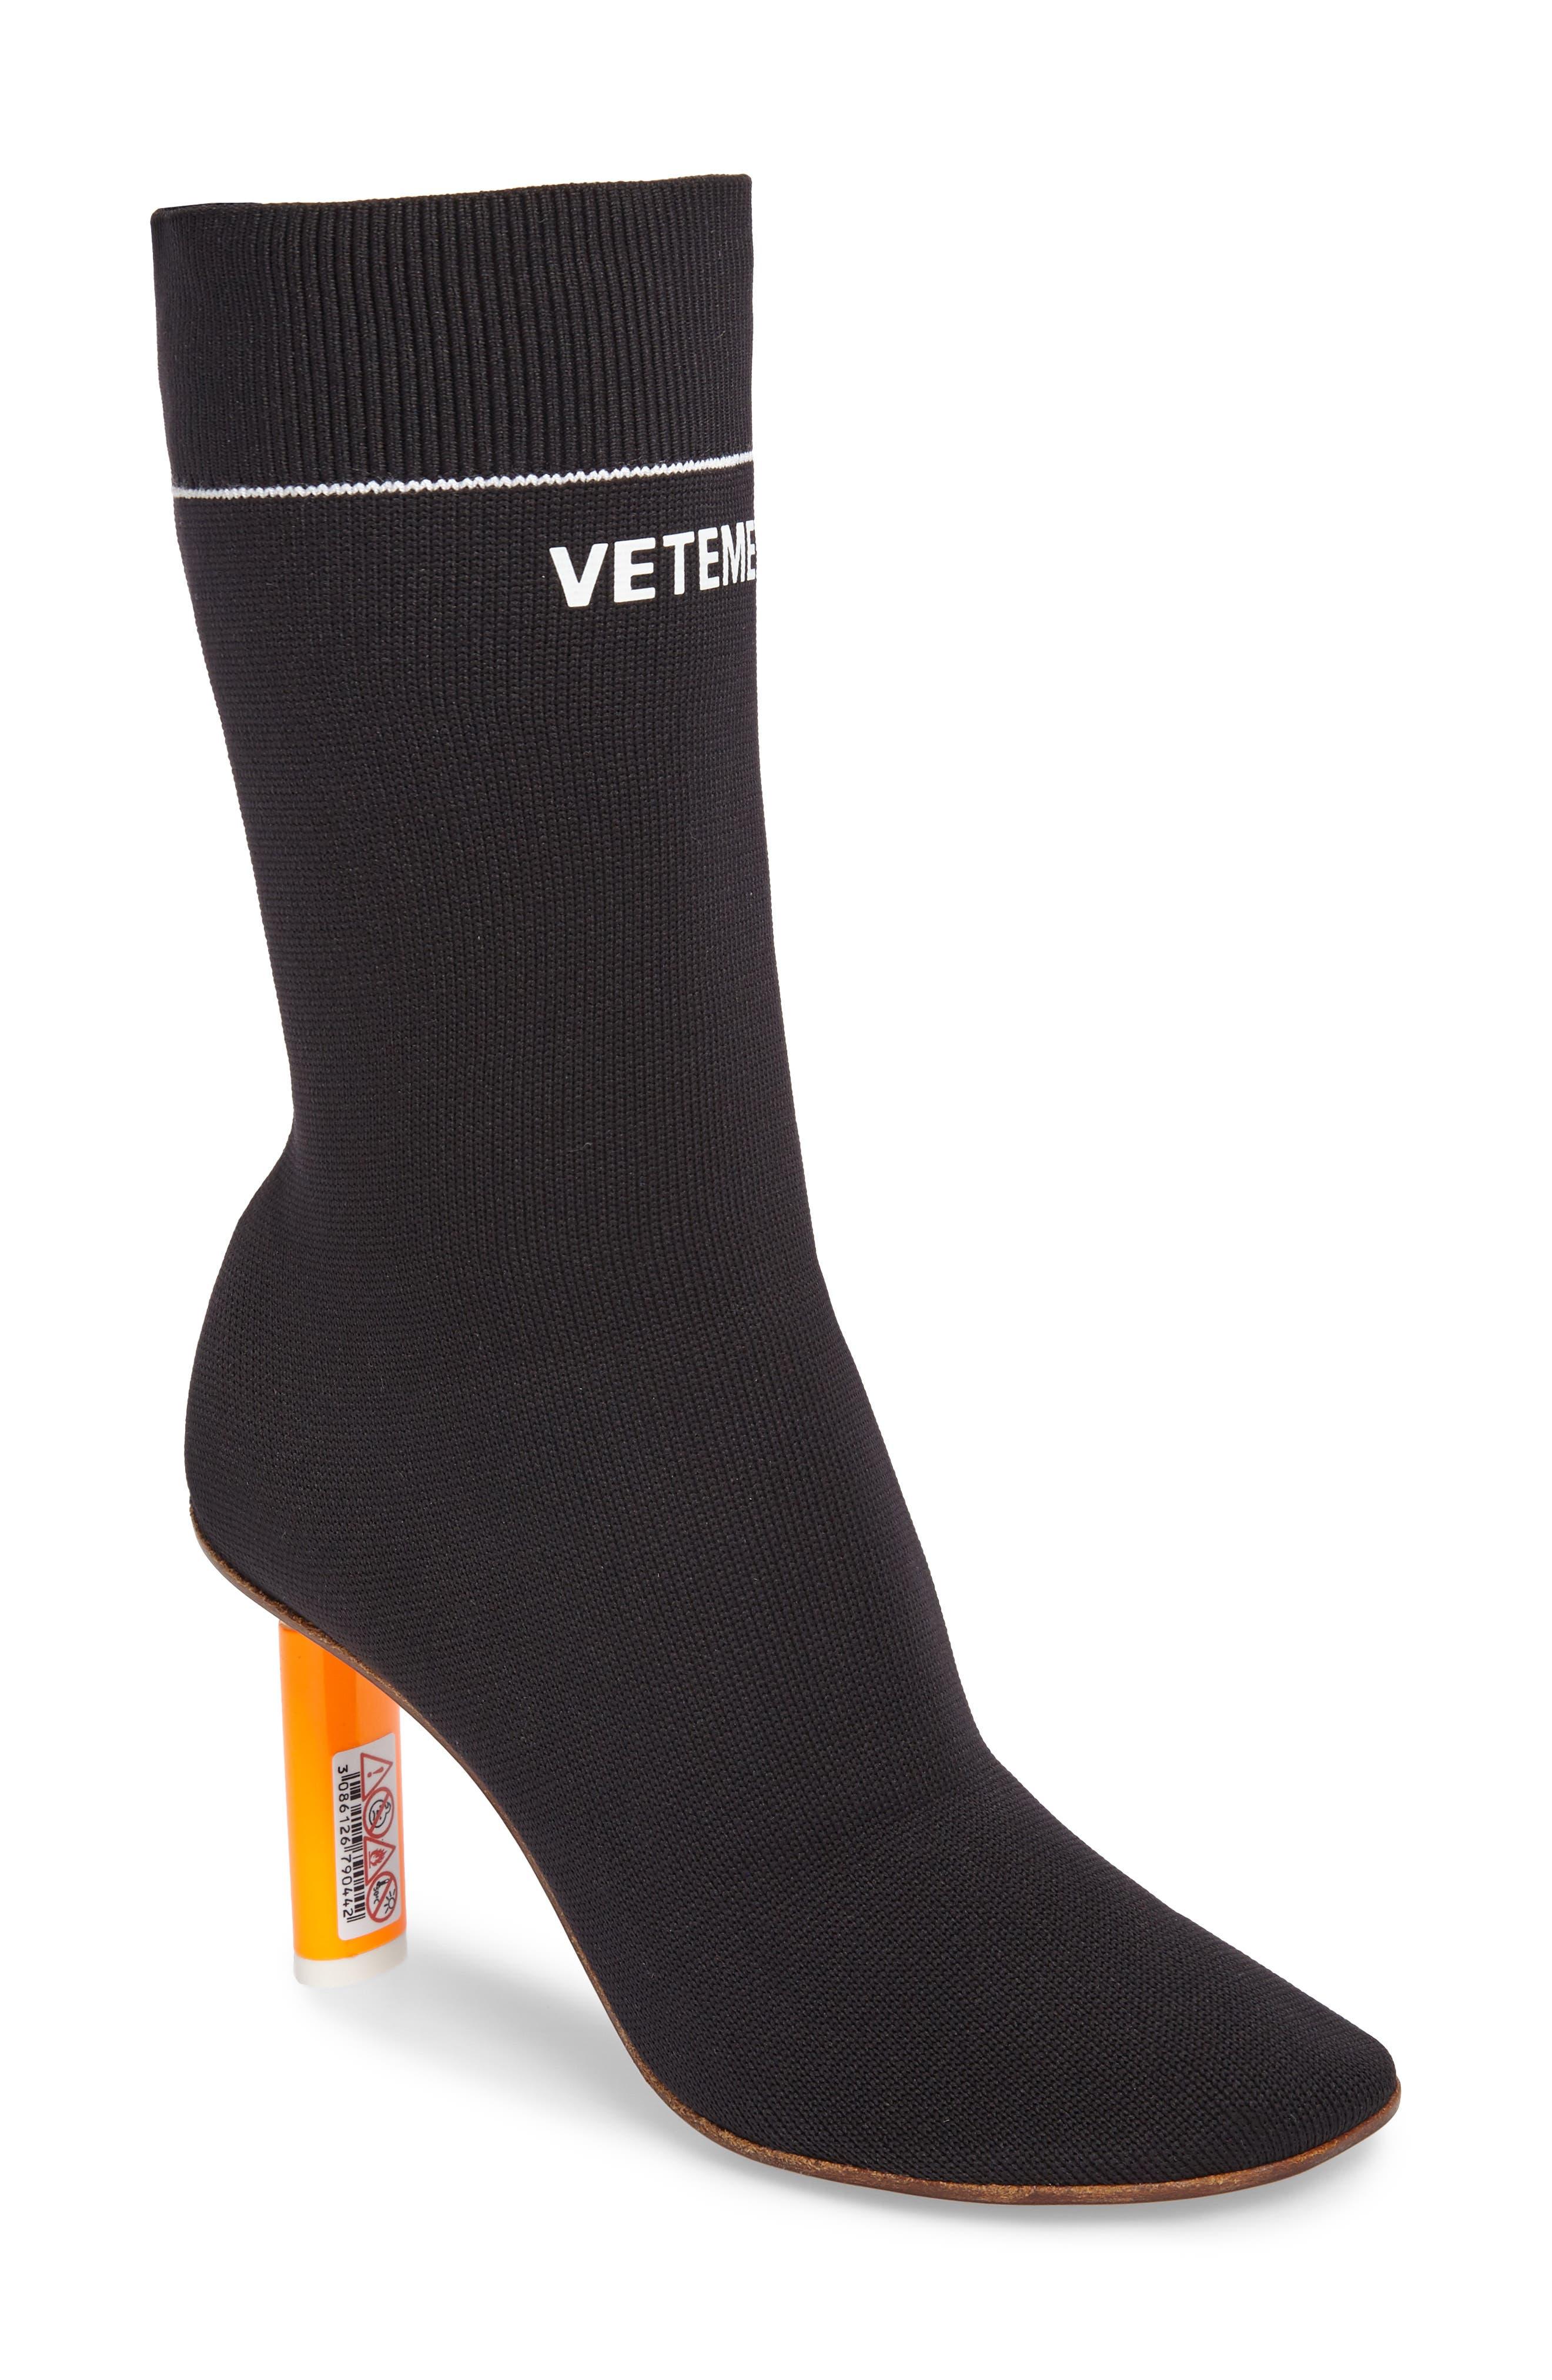 Alternate Image 1 Selected - Vetements Sock Boot (Women)